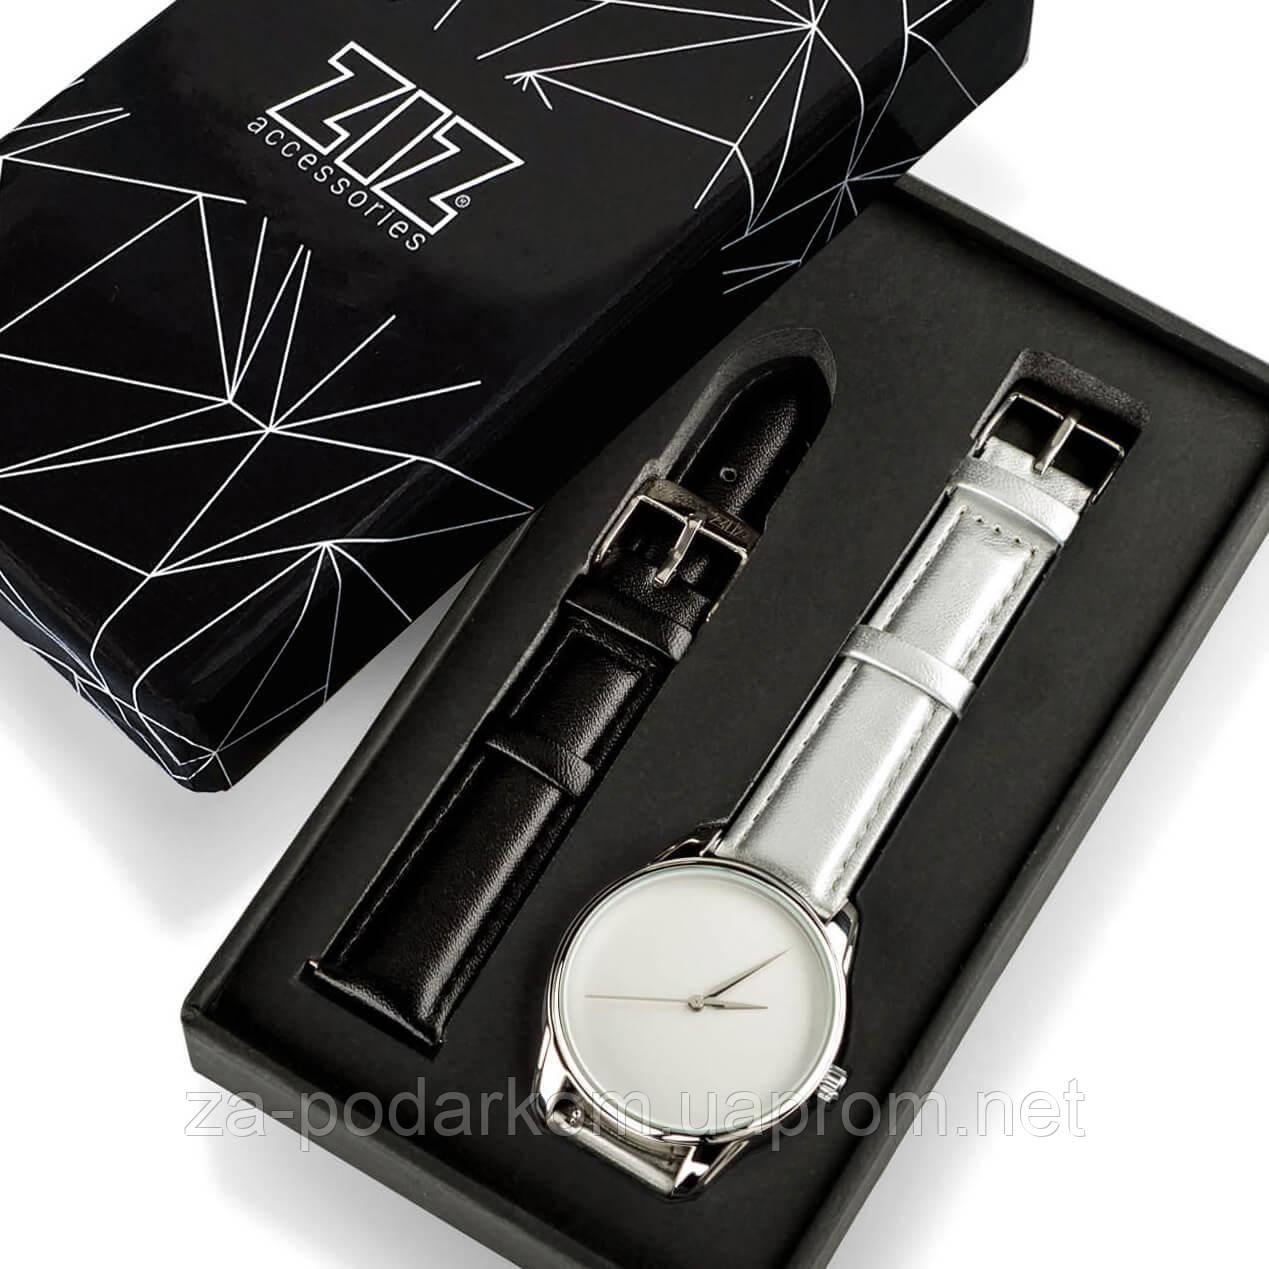 "Часы ""Металлик минимализм"" подарок женщине, мужчине"